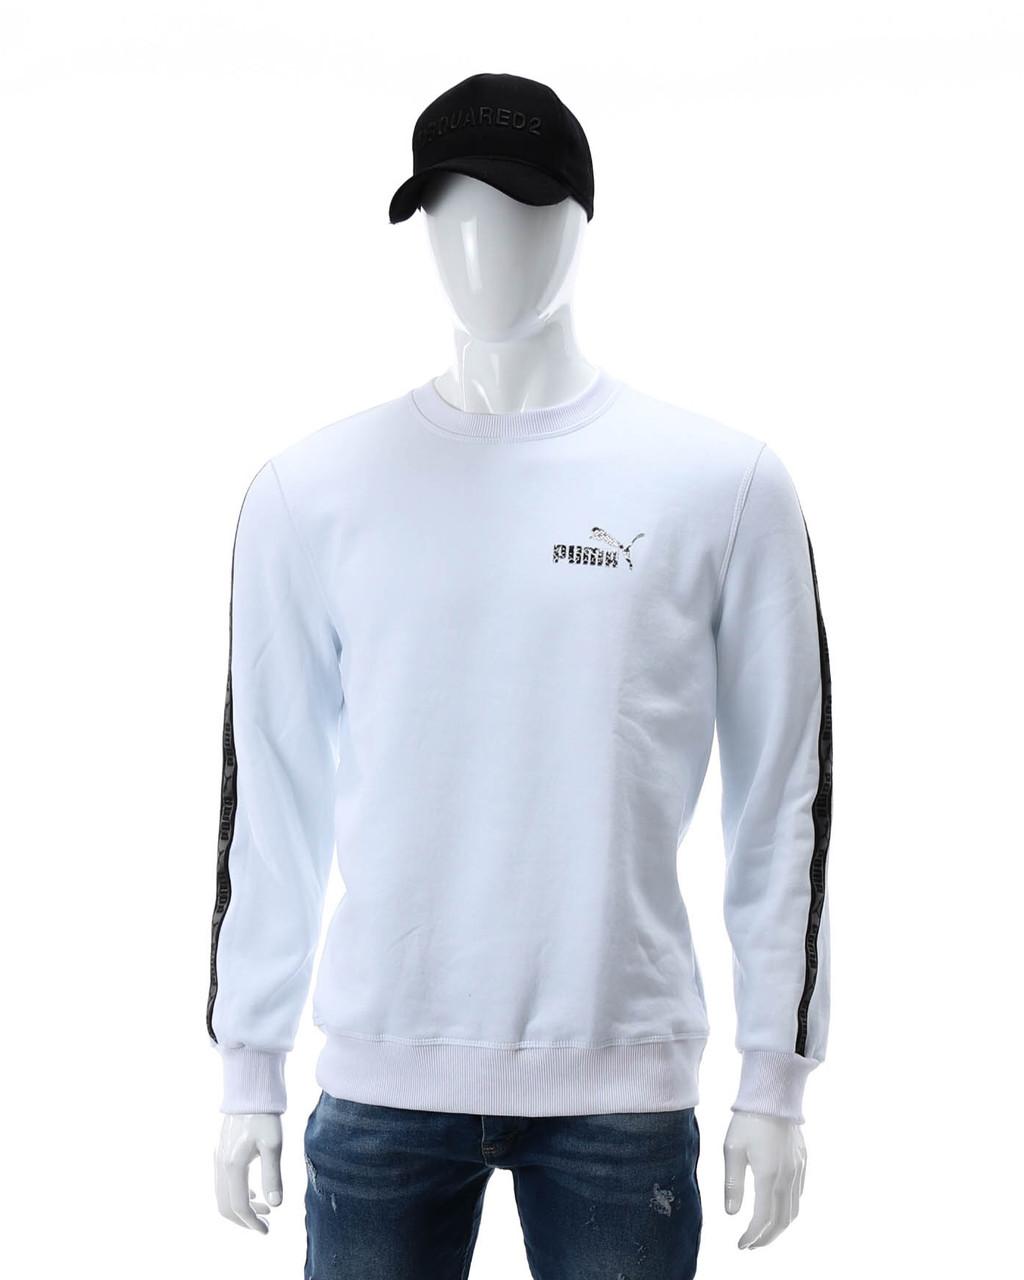 Свитшот осень-зима белый PUMA №5 с лентой WHT XL(Р) 20-402-003-002